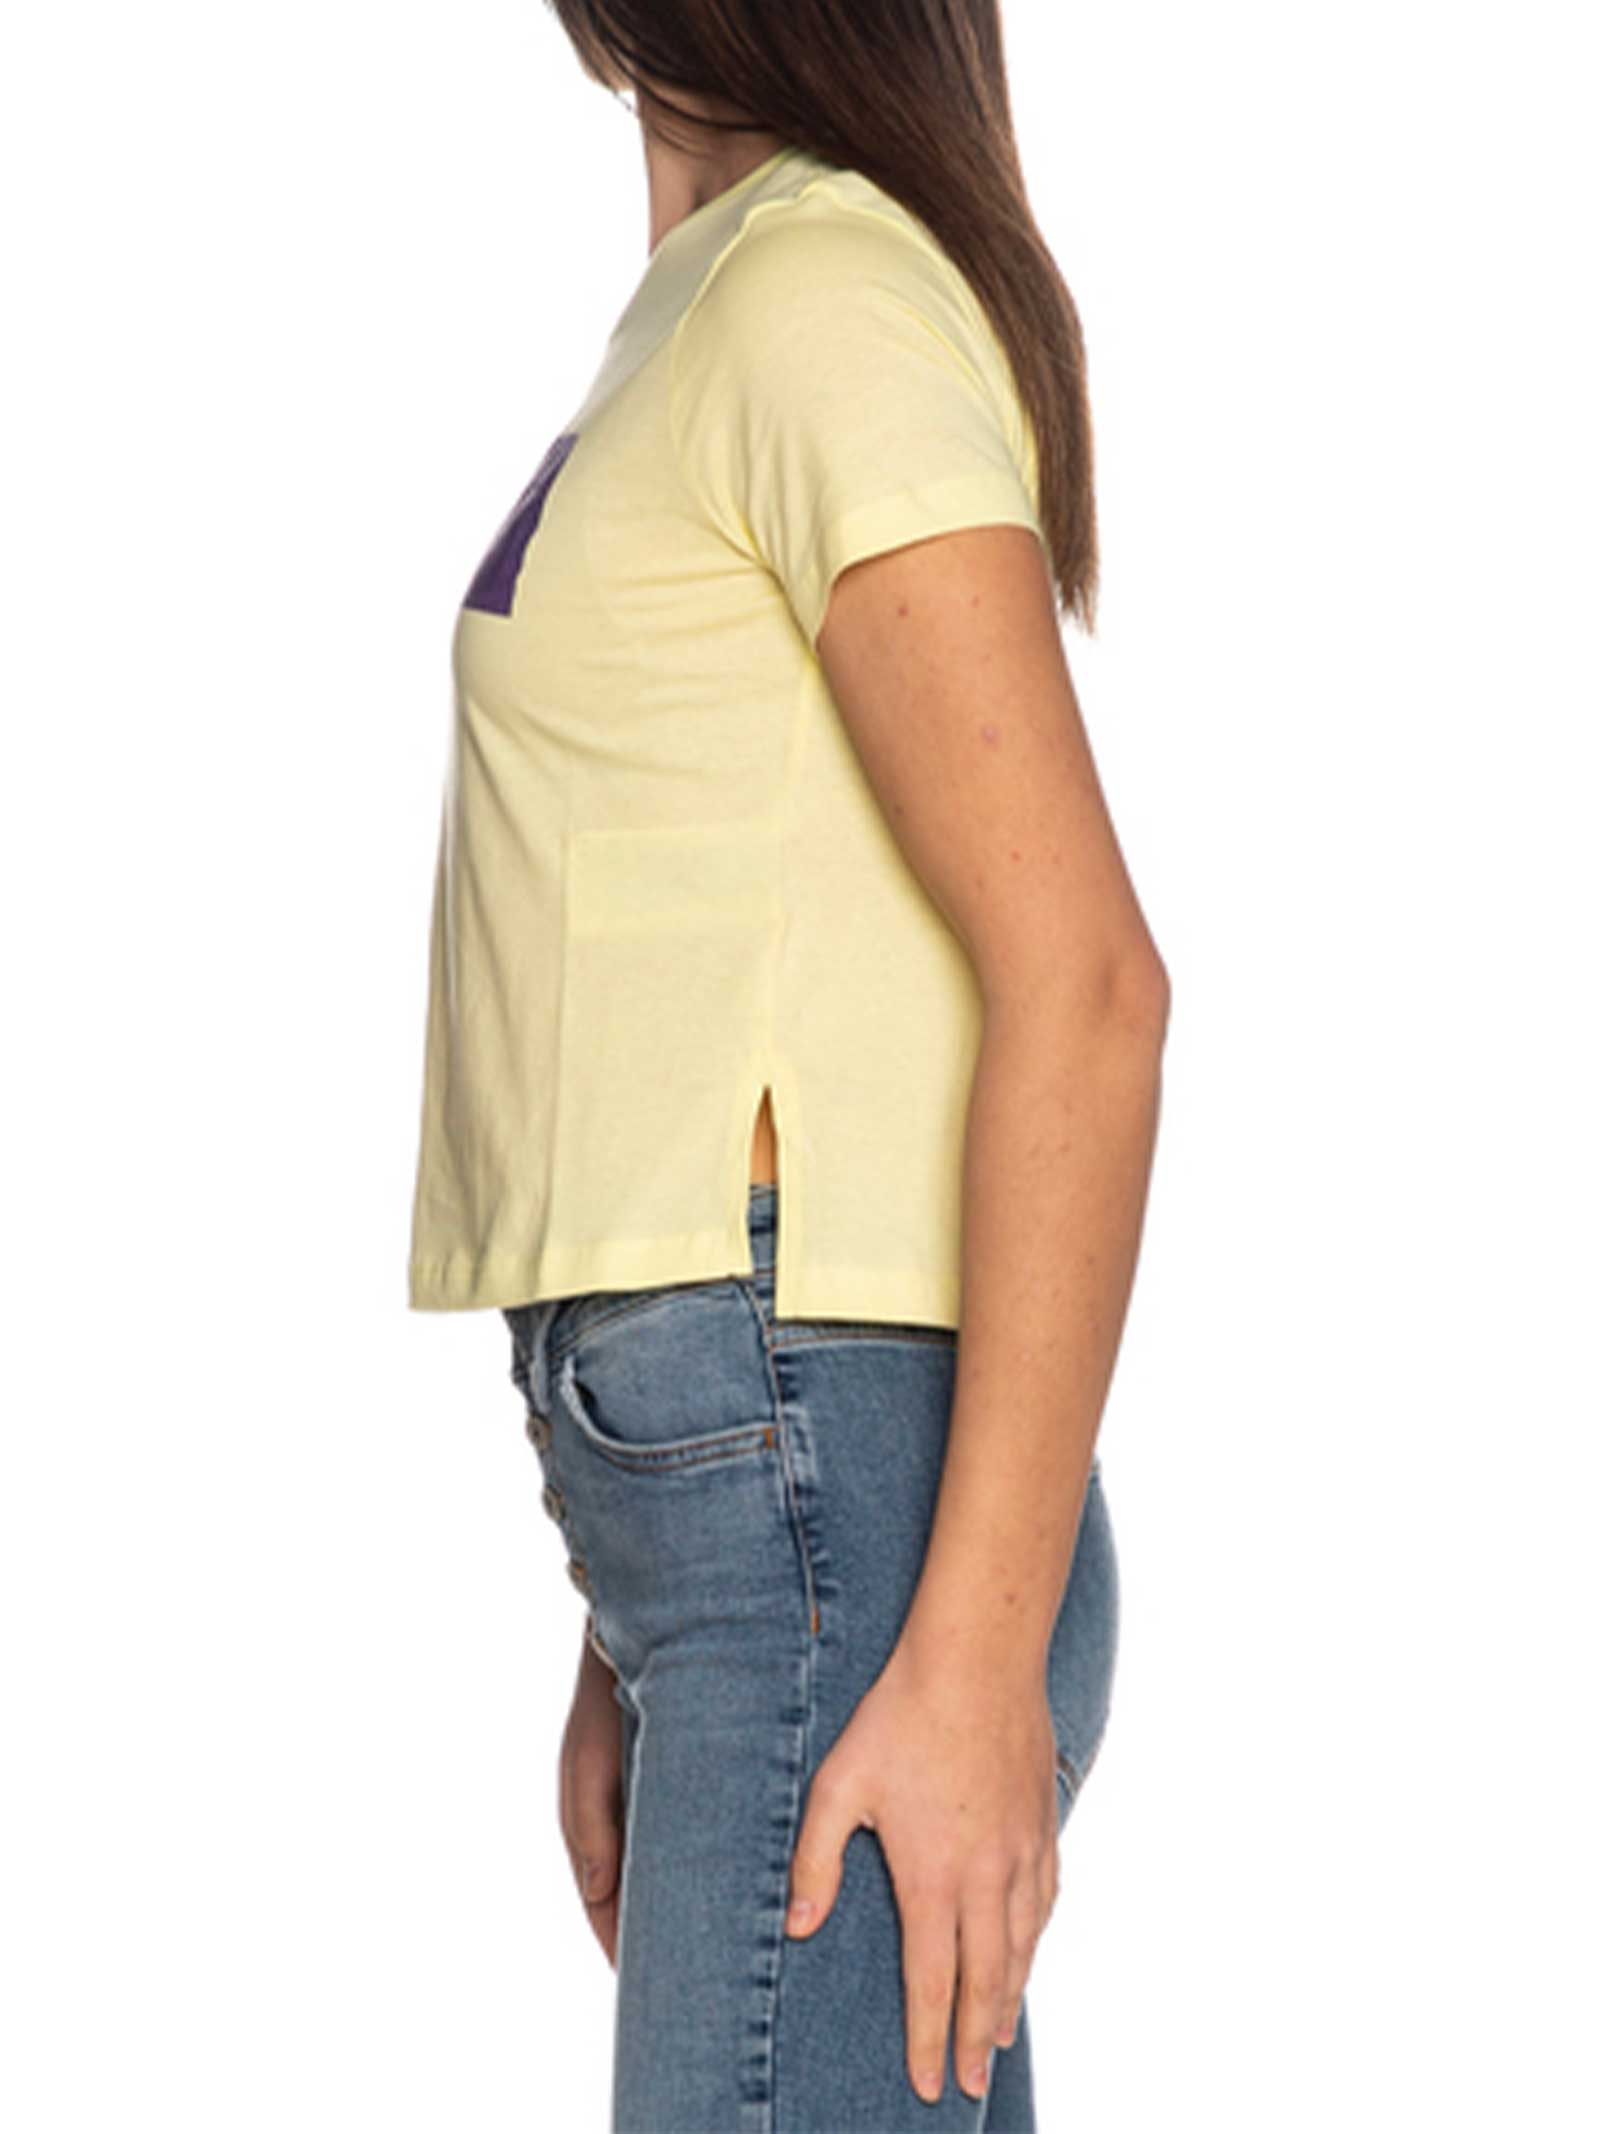 T-SHIRT DONNA GUESS | T-shirt | W1RI05-JA900G2M2